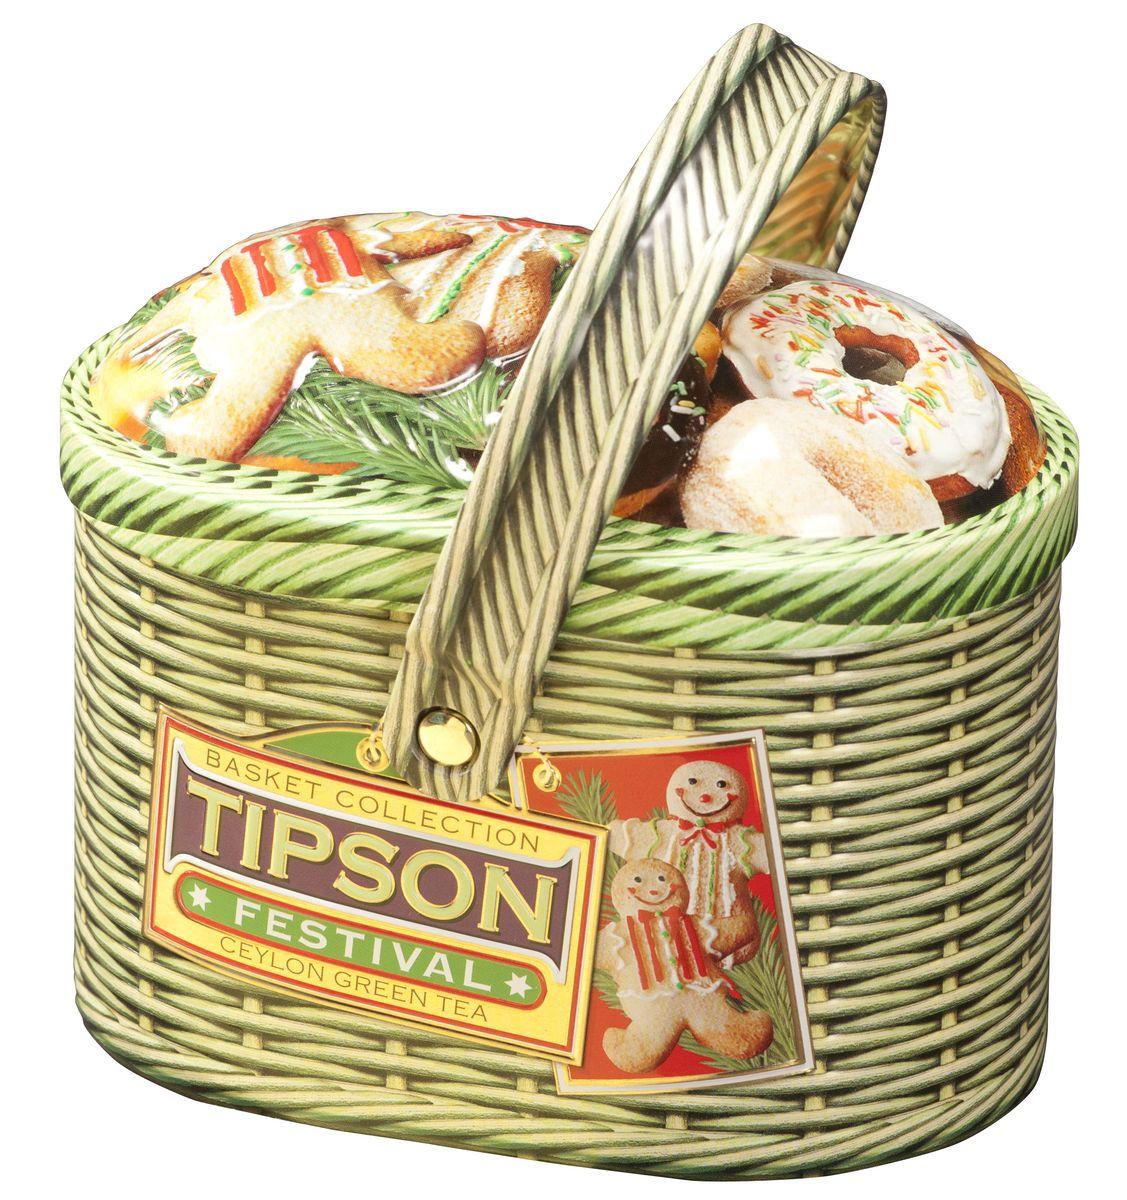 Tipson Festival зеленый листовой чай, 100 г (жестяная банка) tipson империал 3 чайный набор стеклянный чайник и чай 50 г